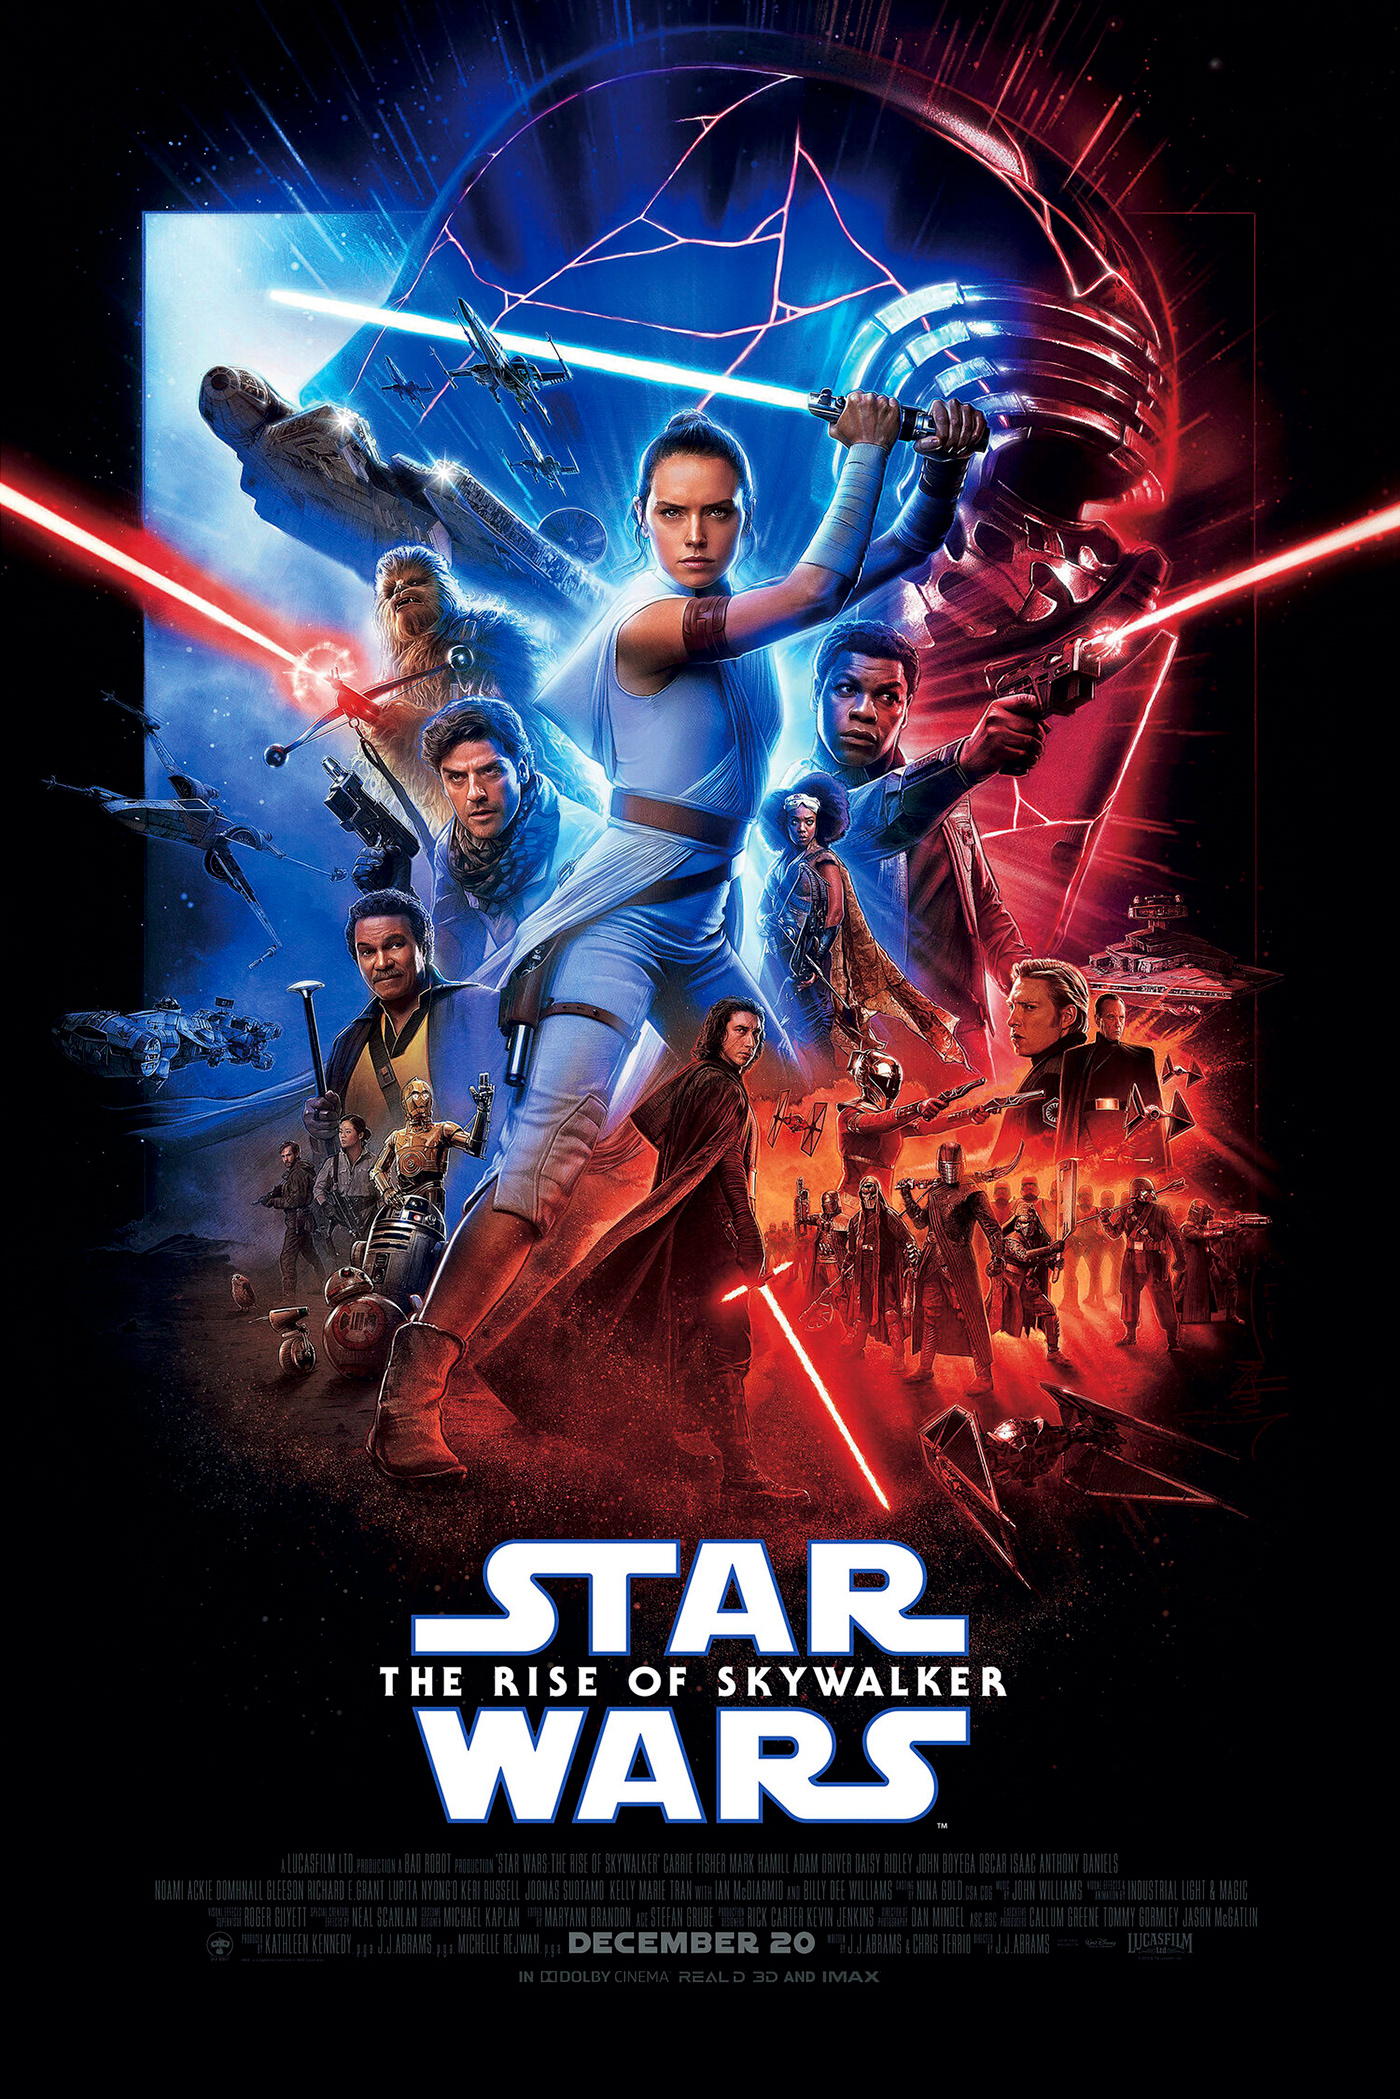 Star Wars The Rise Of Skywalker International Poster On Behance